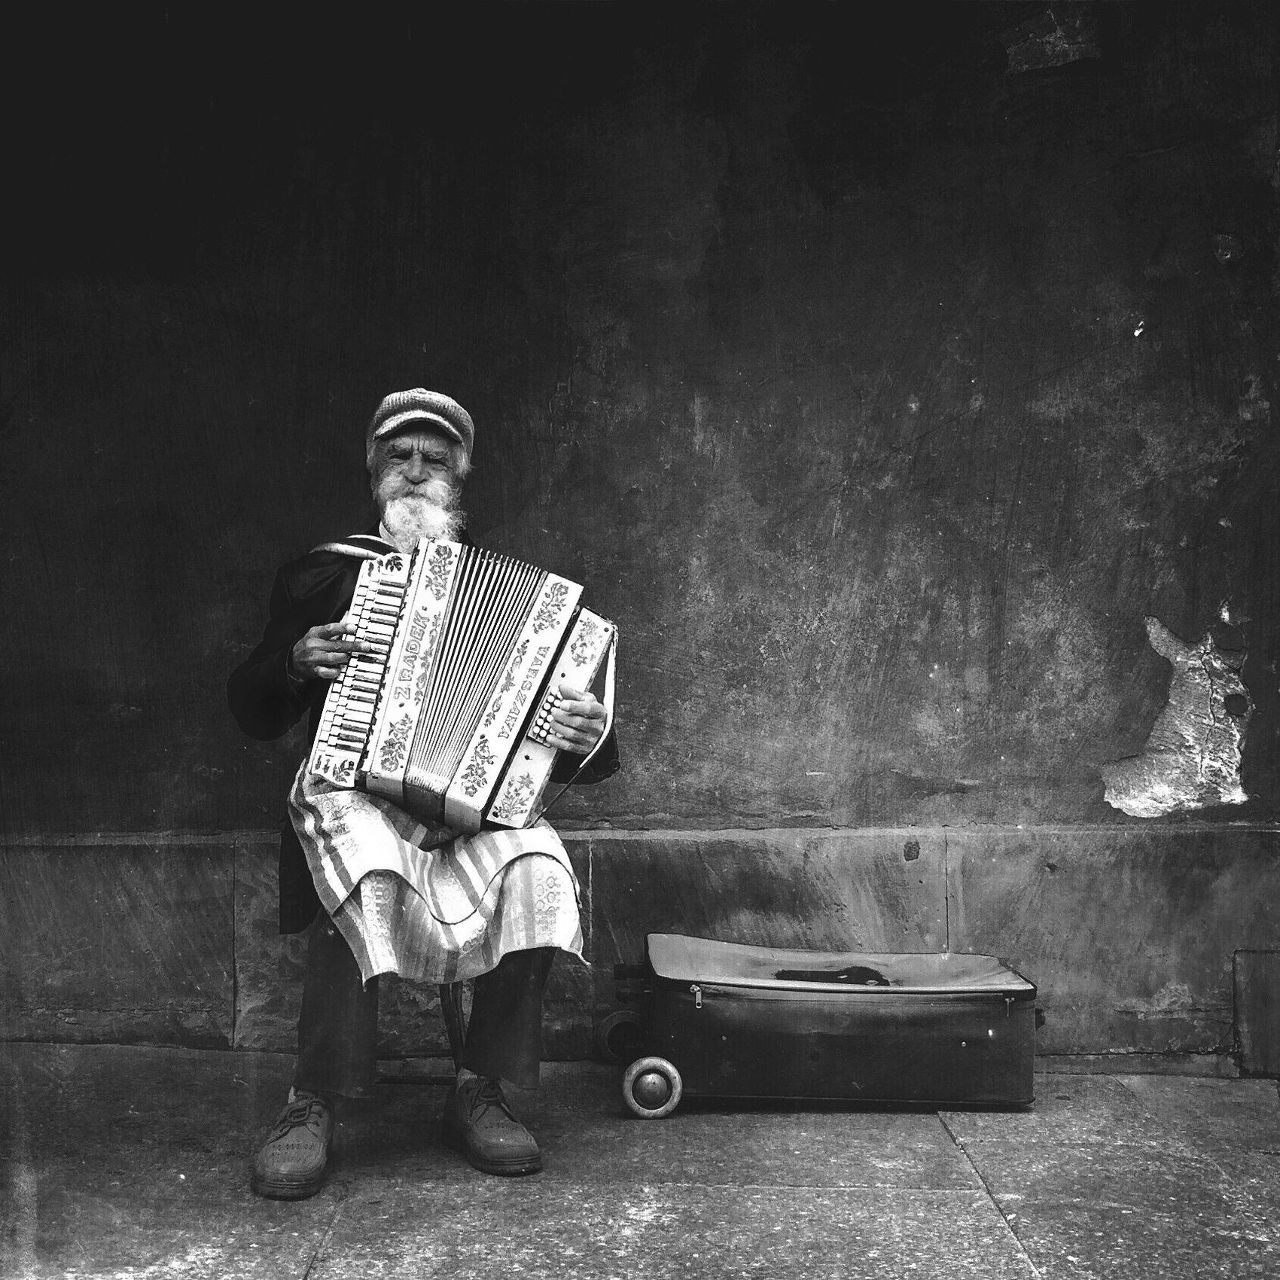 Michał Koralewski 1st Place Photographer of the Year